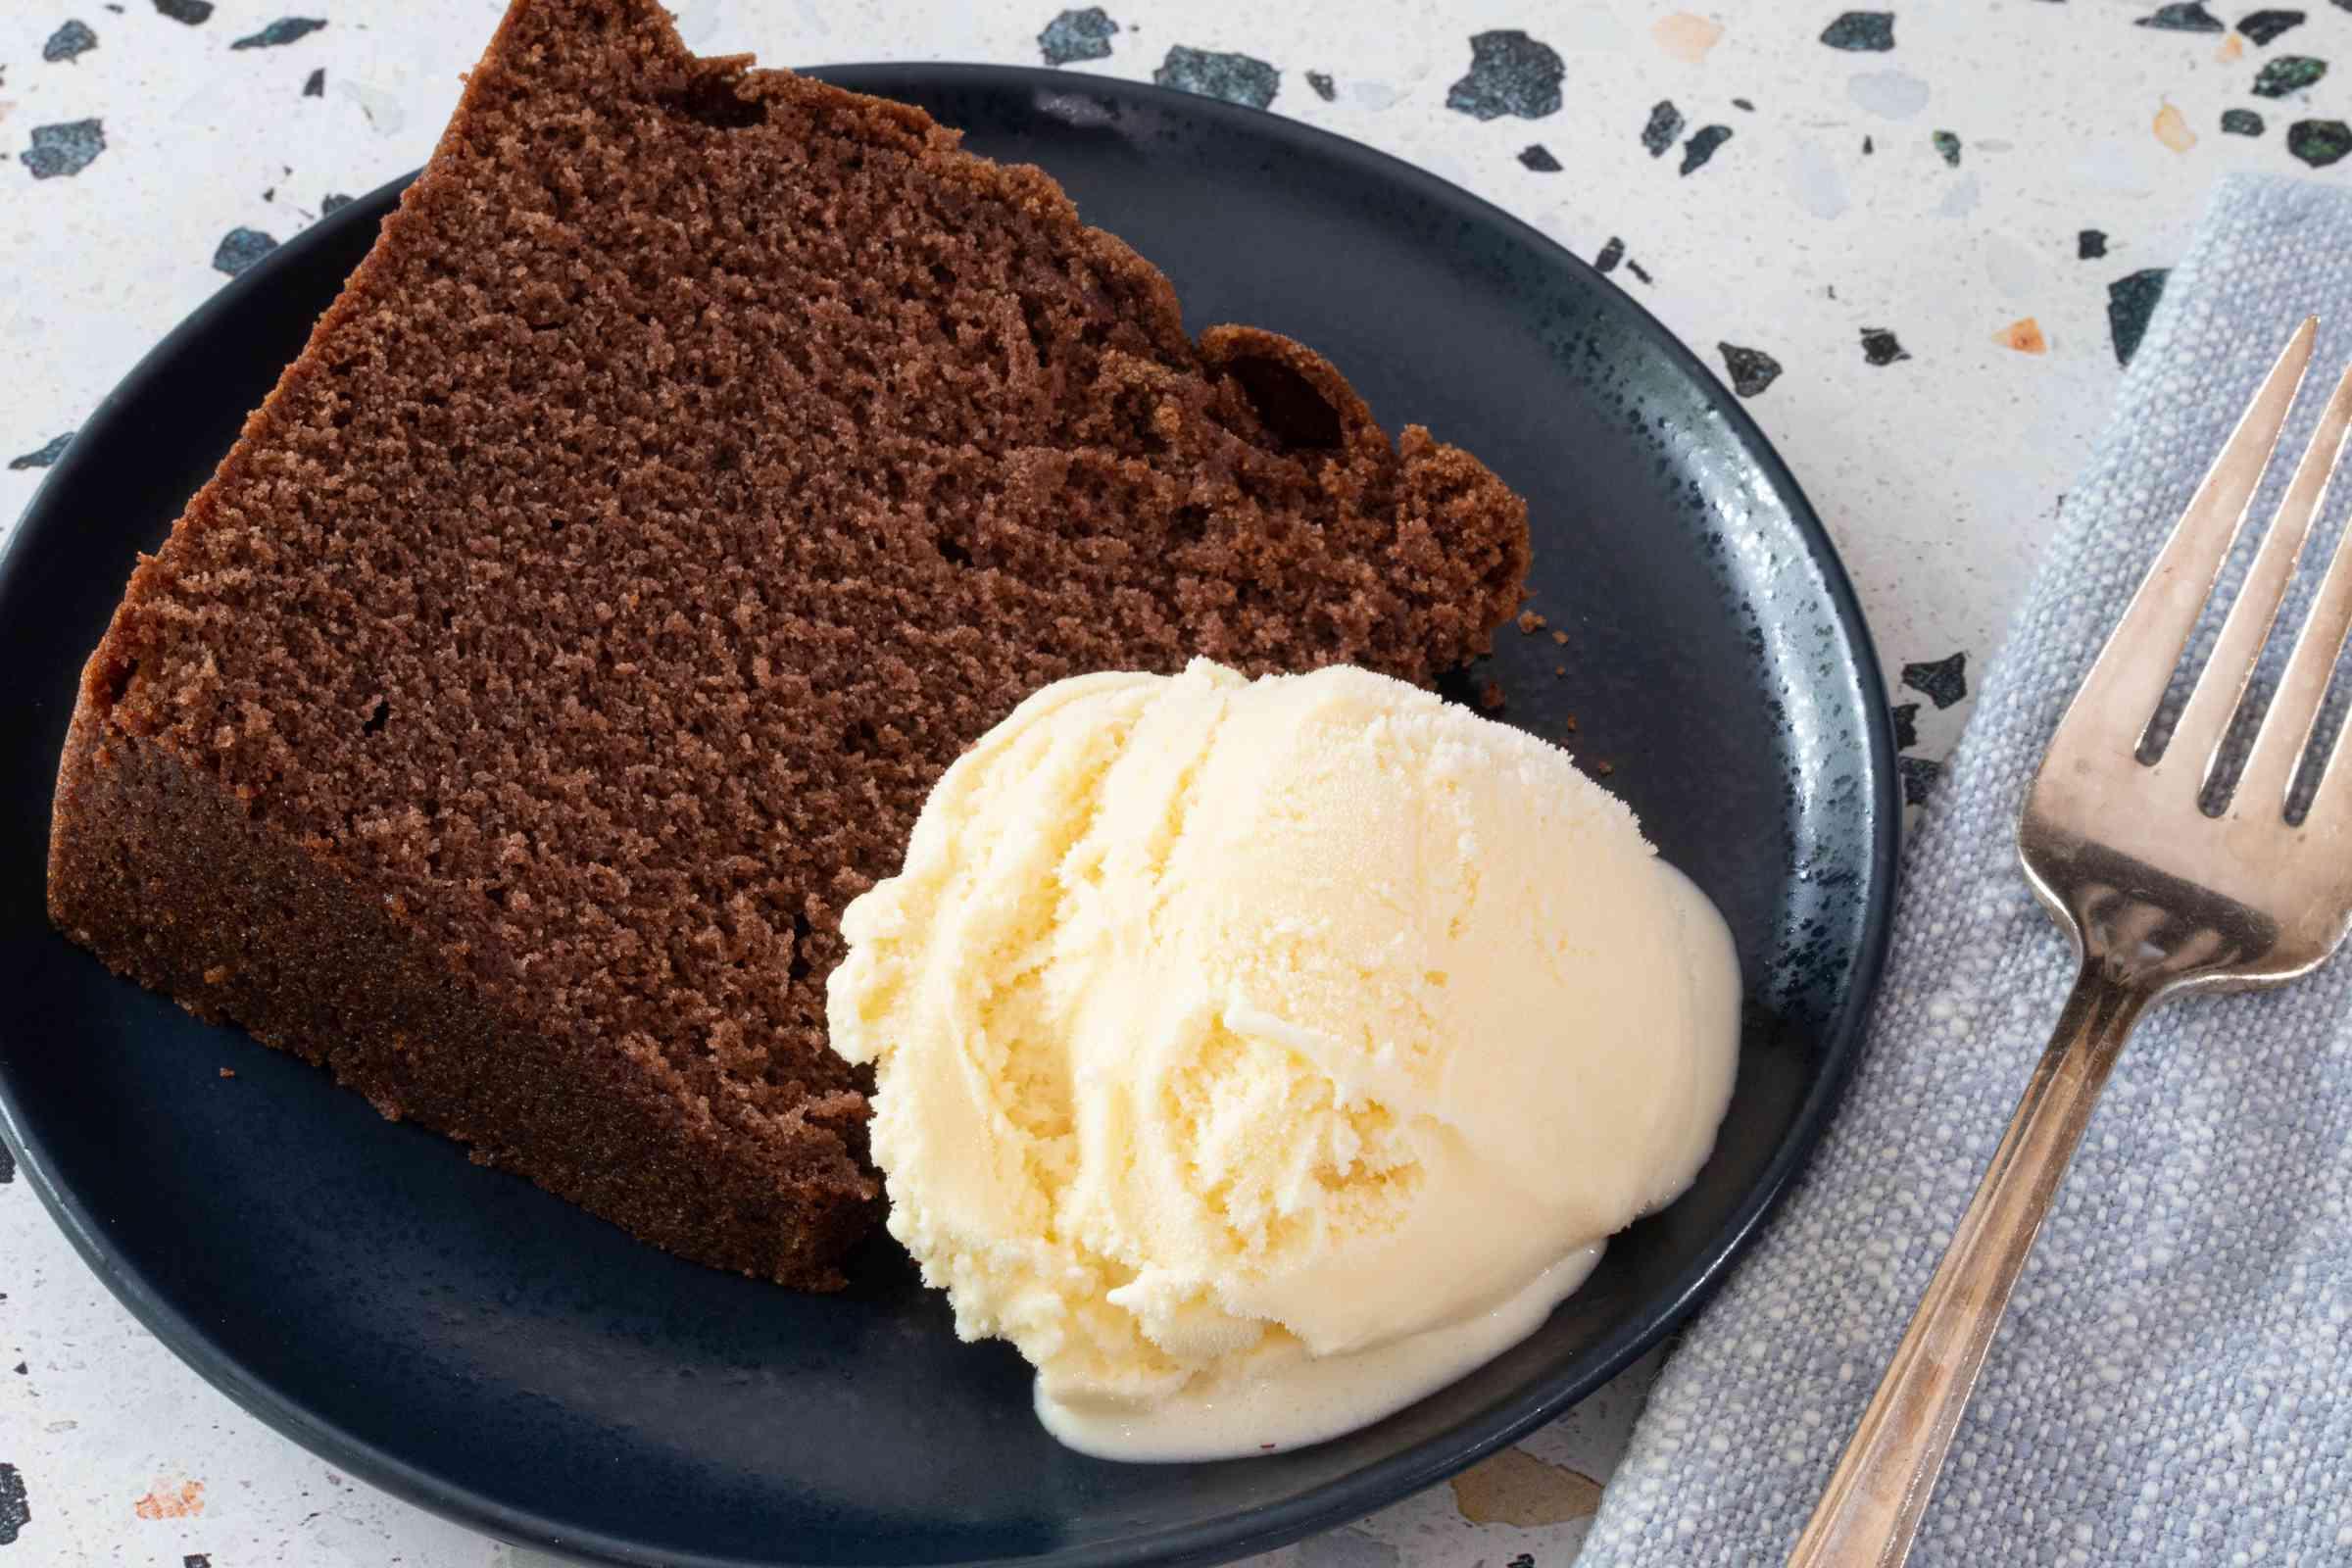 Slice of chocolate cake with vanilla ice cream.